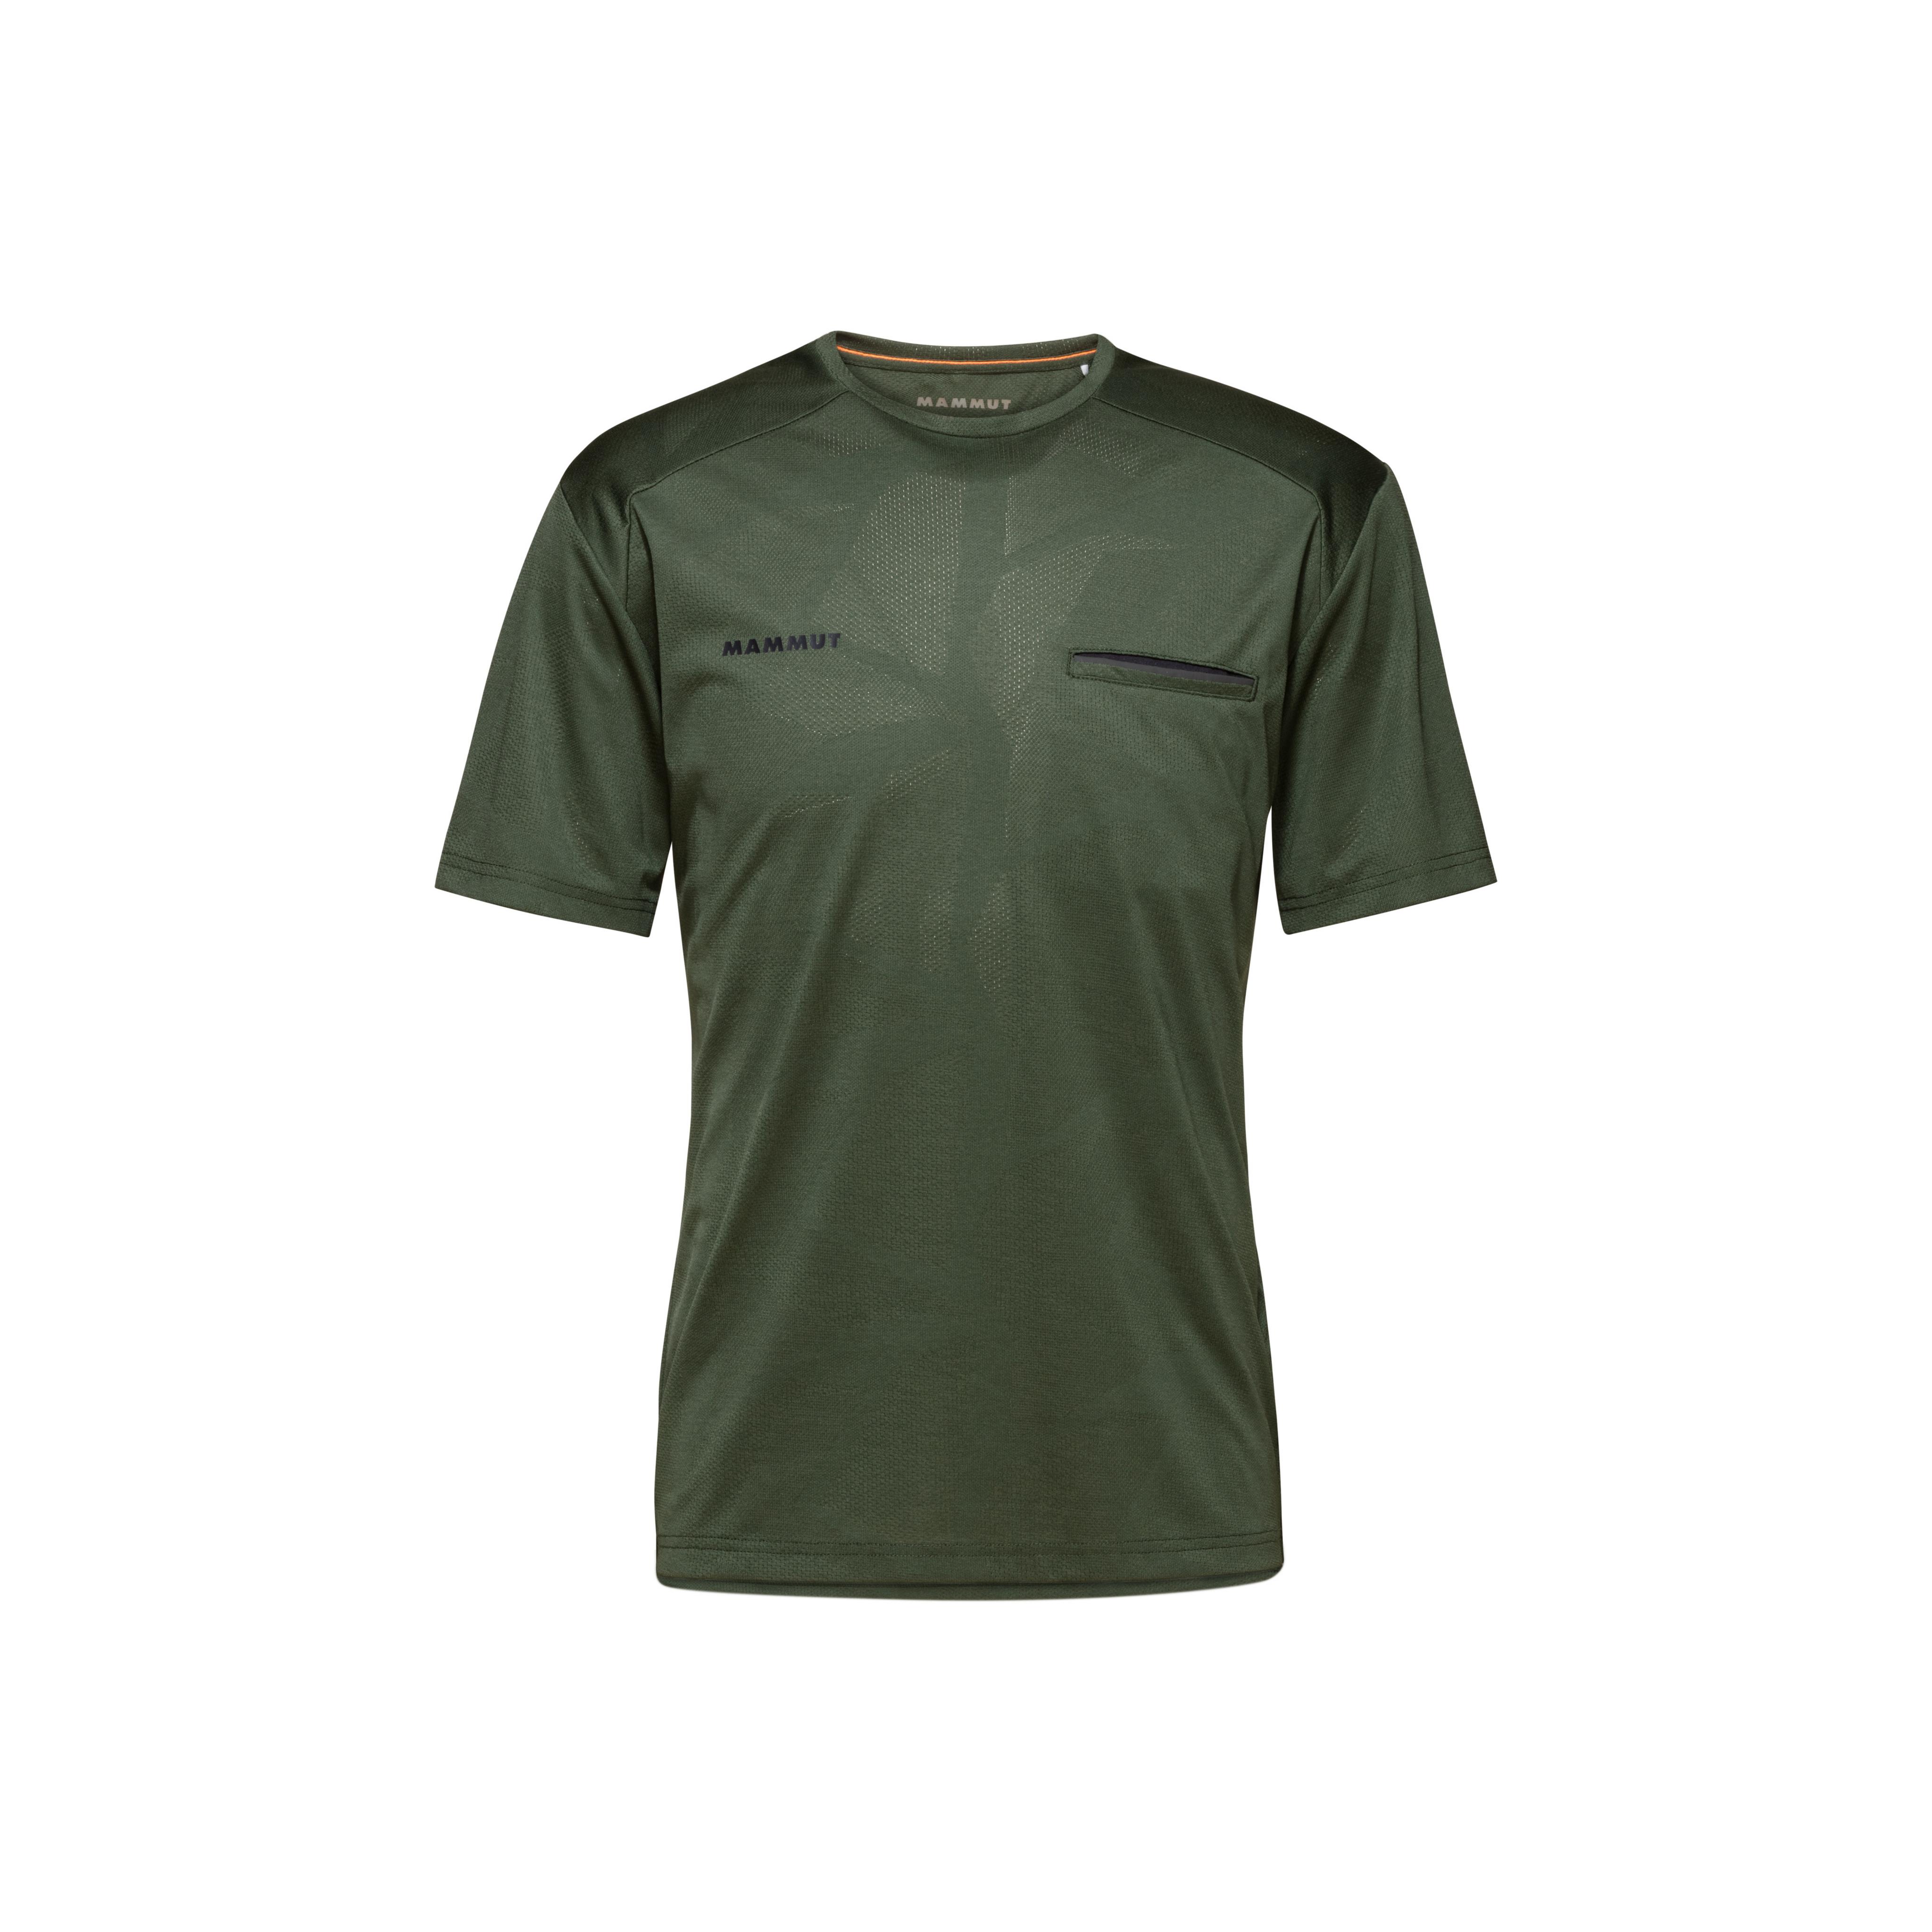 Crashiano T-Shirt Men - S, woods melange thumbnail